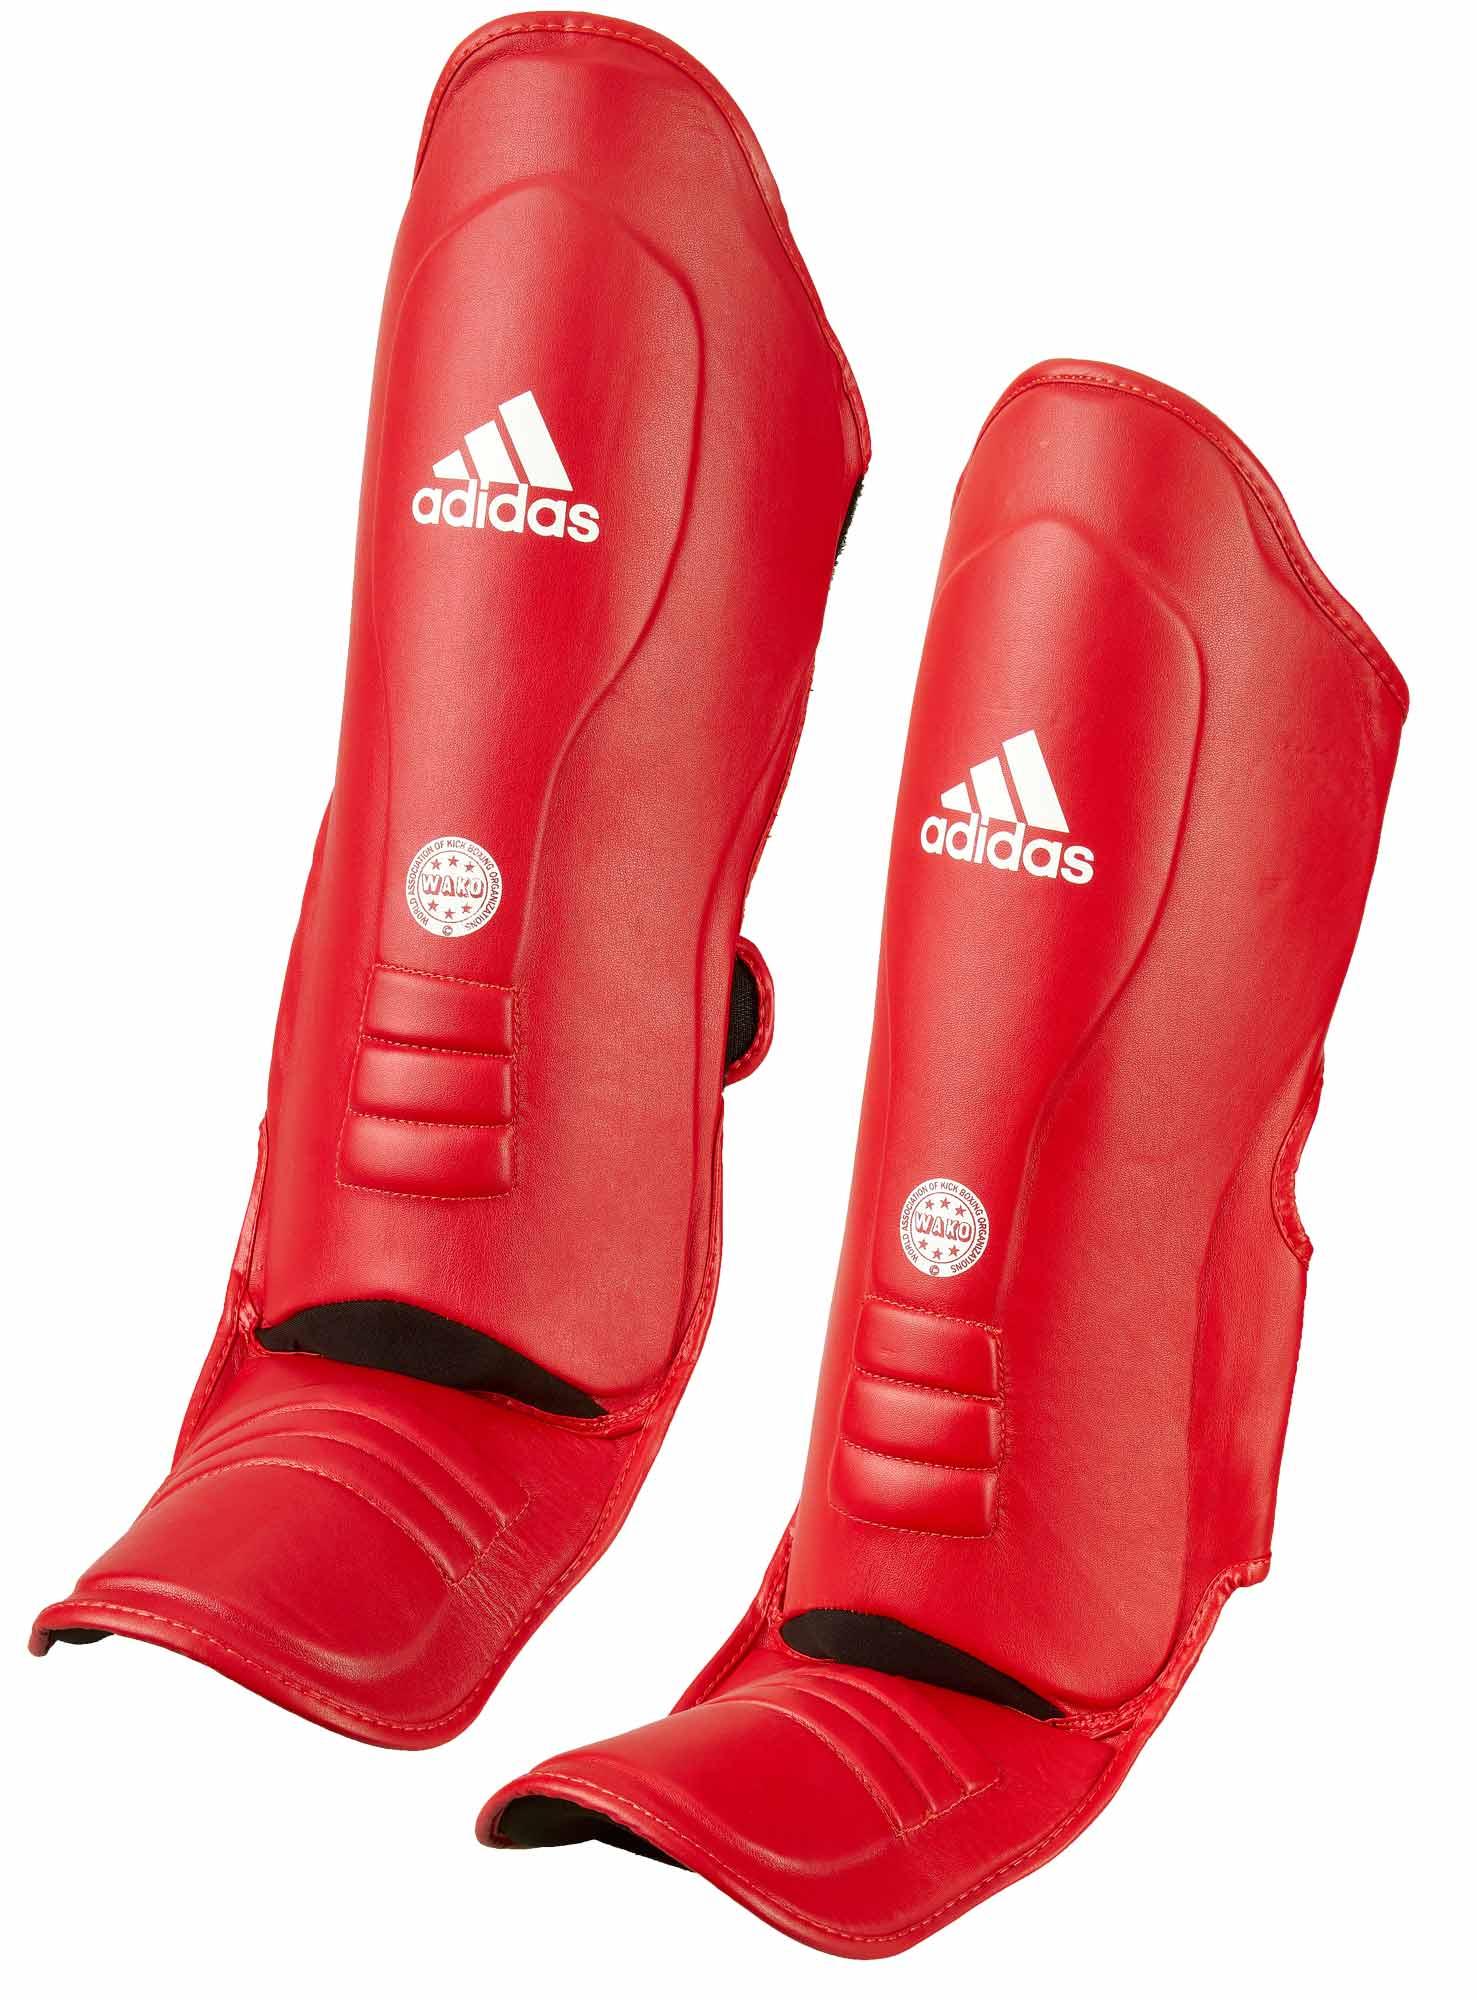 adidas Super Pro Shin n Step red, WAKO, ADIWAKOGSS11